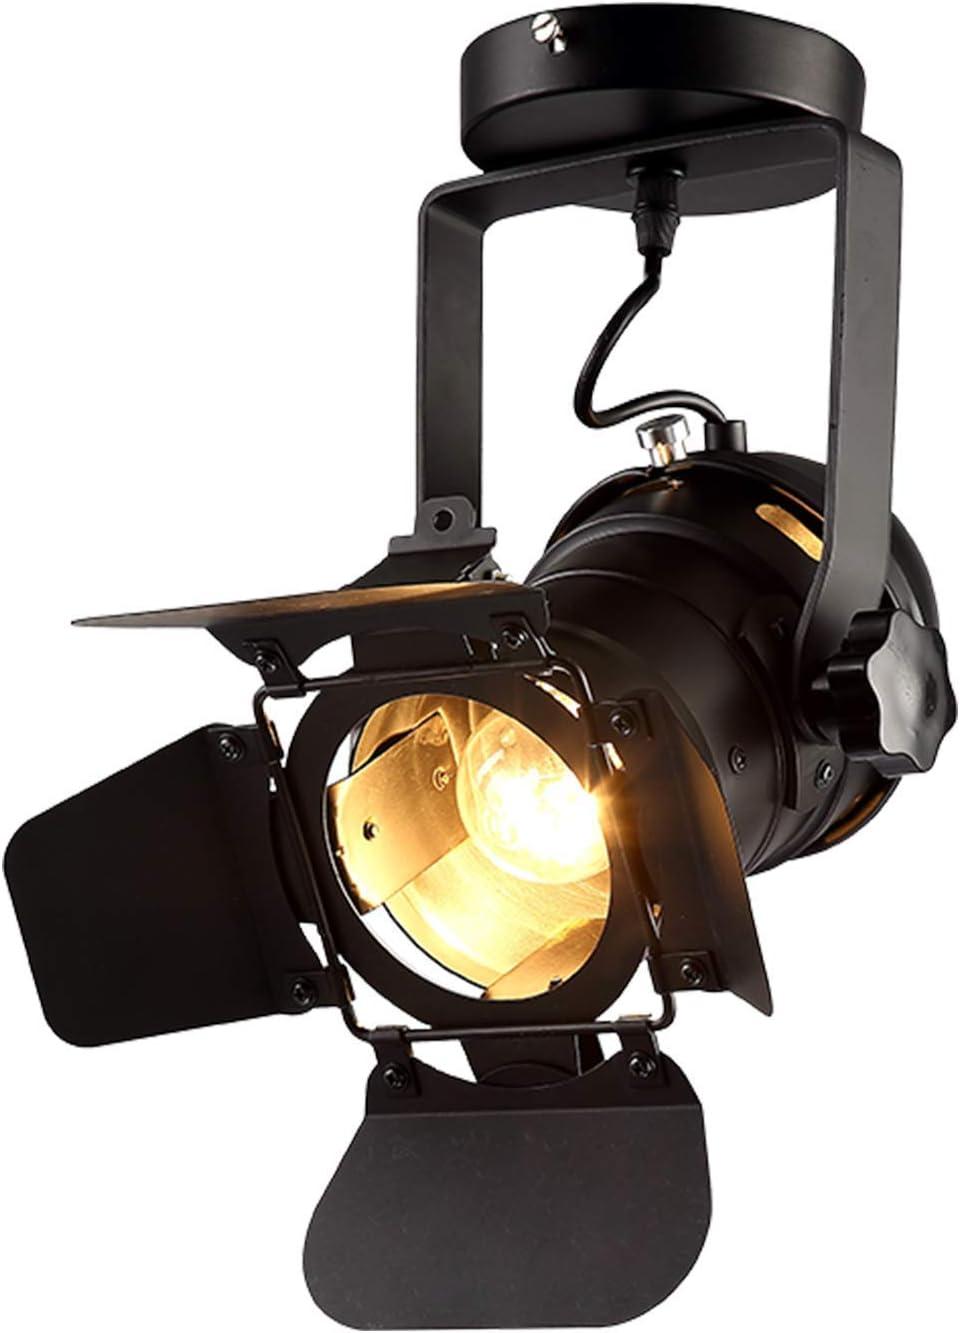 Retro Style 3 Way Eyeball Ceiling Spotlight Fitting Copper Spot Light Lighting